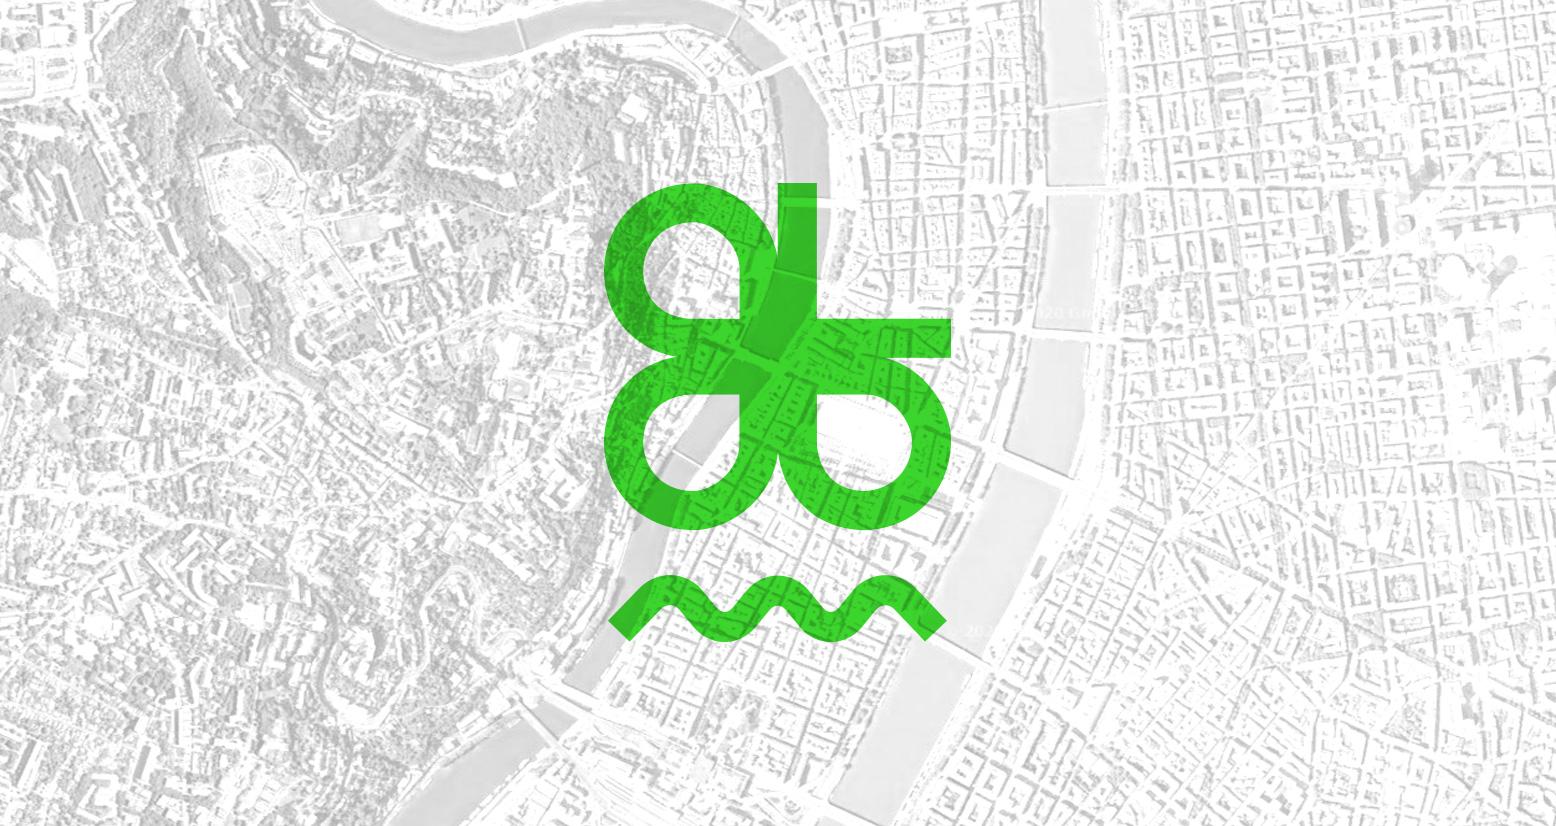 web agency Greentic - 5 rue de Castries 69002 Lyon